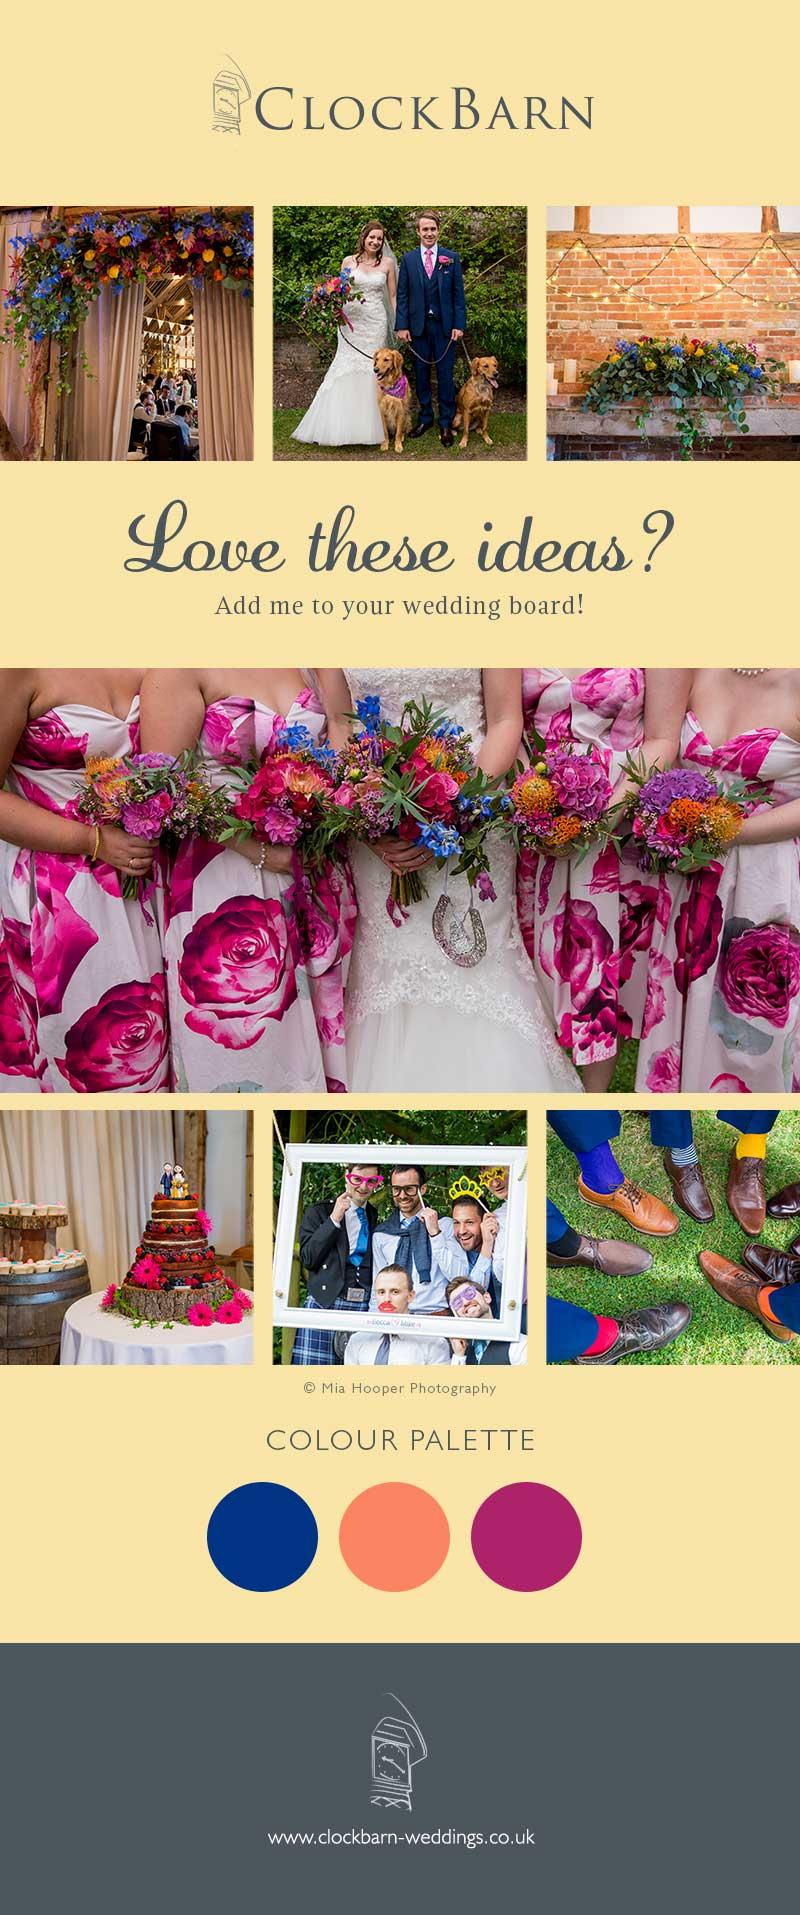 Rebecca and Micheal Clock Barn wedding